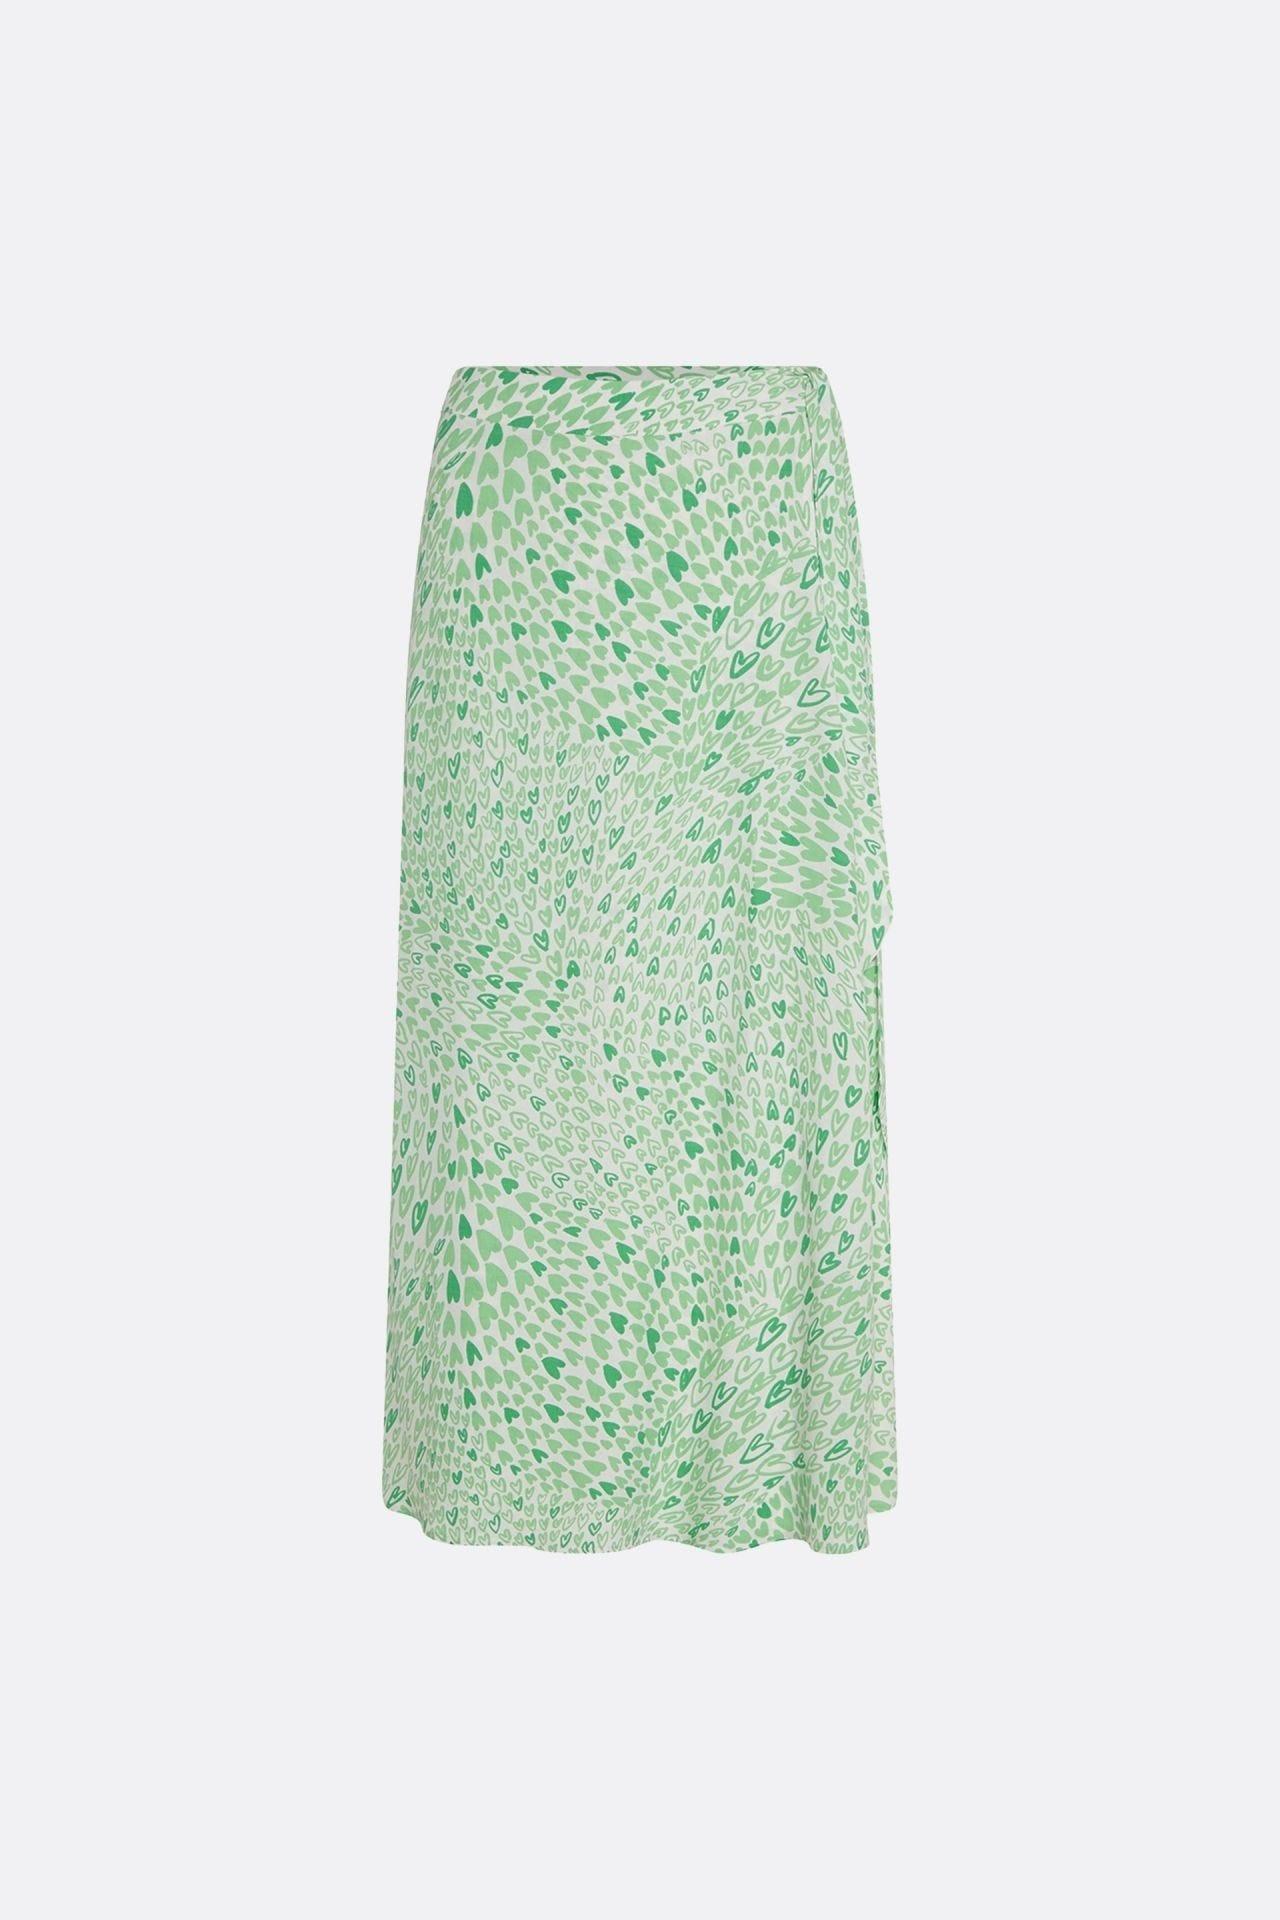 Fabienne Chapot Skirt BOBO CLT-153-1